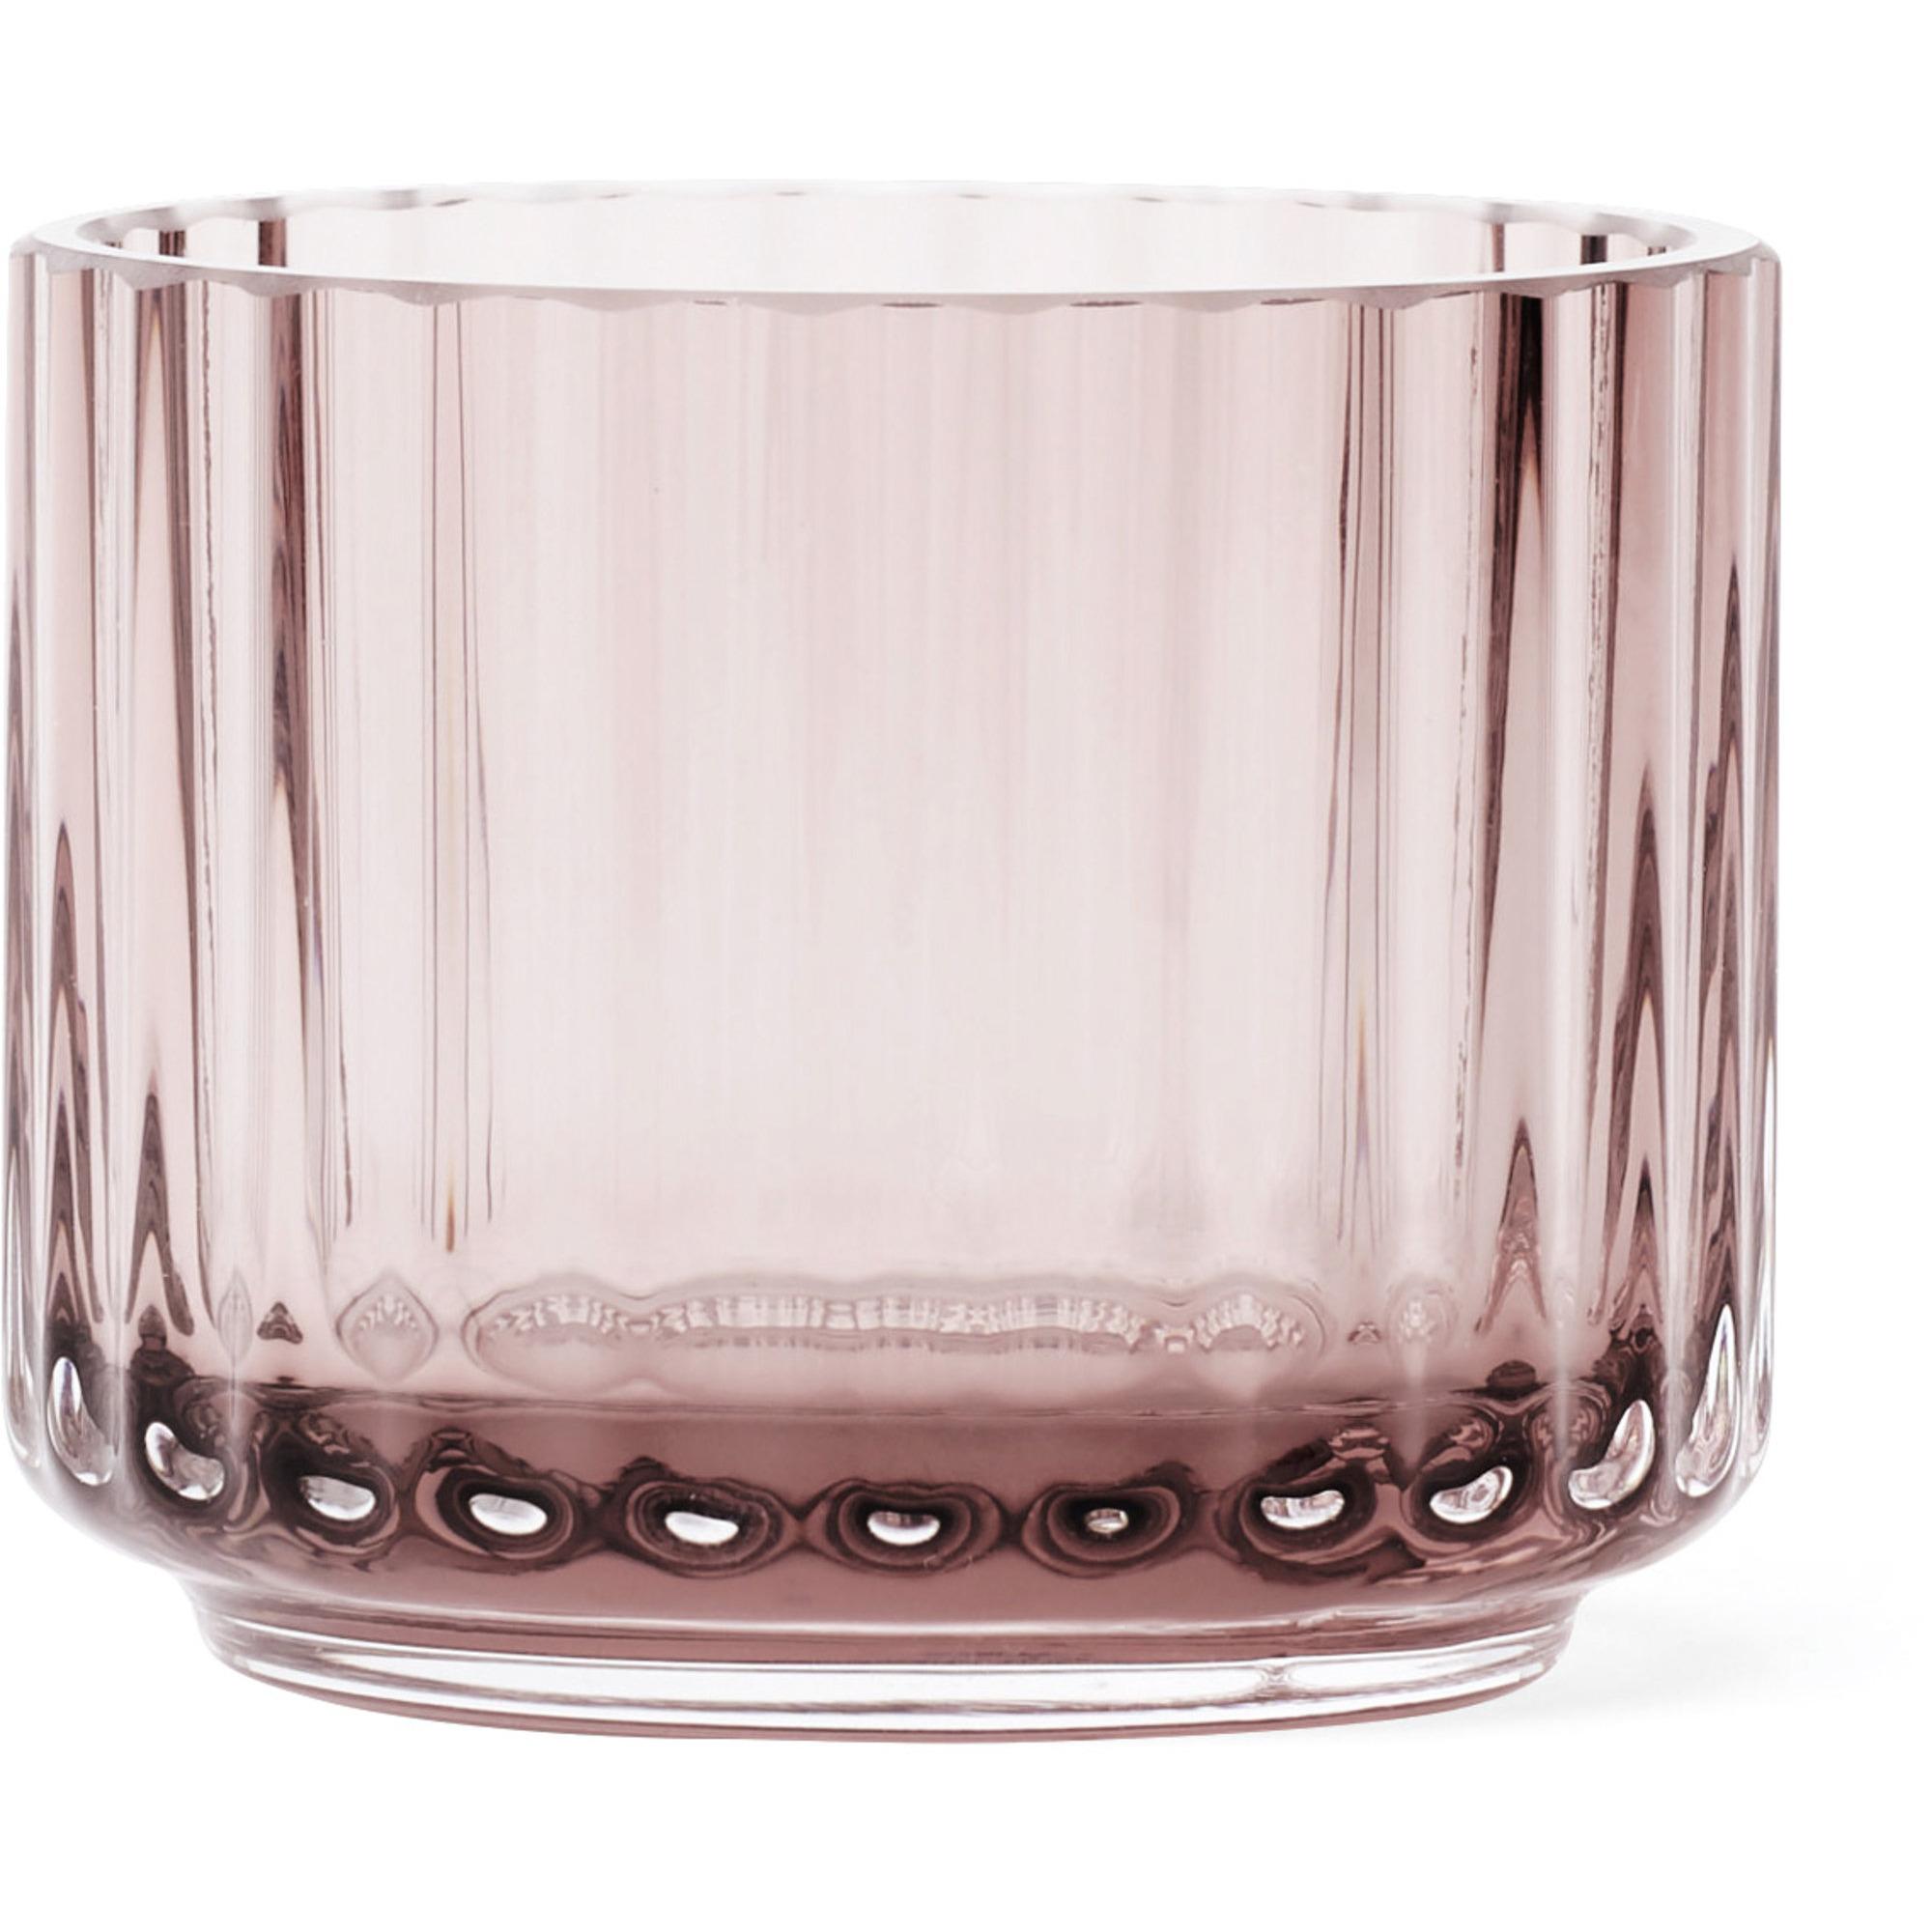 Lyngby Porcelæn Ljuslykta glas liten burgundy